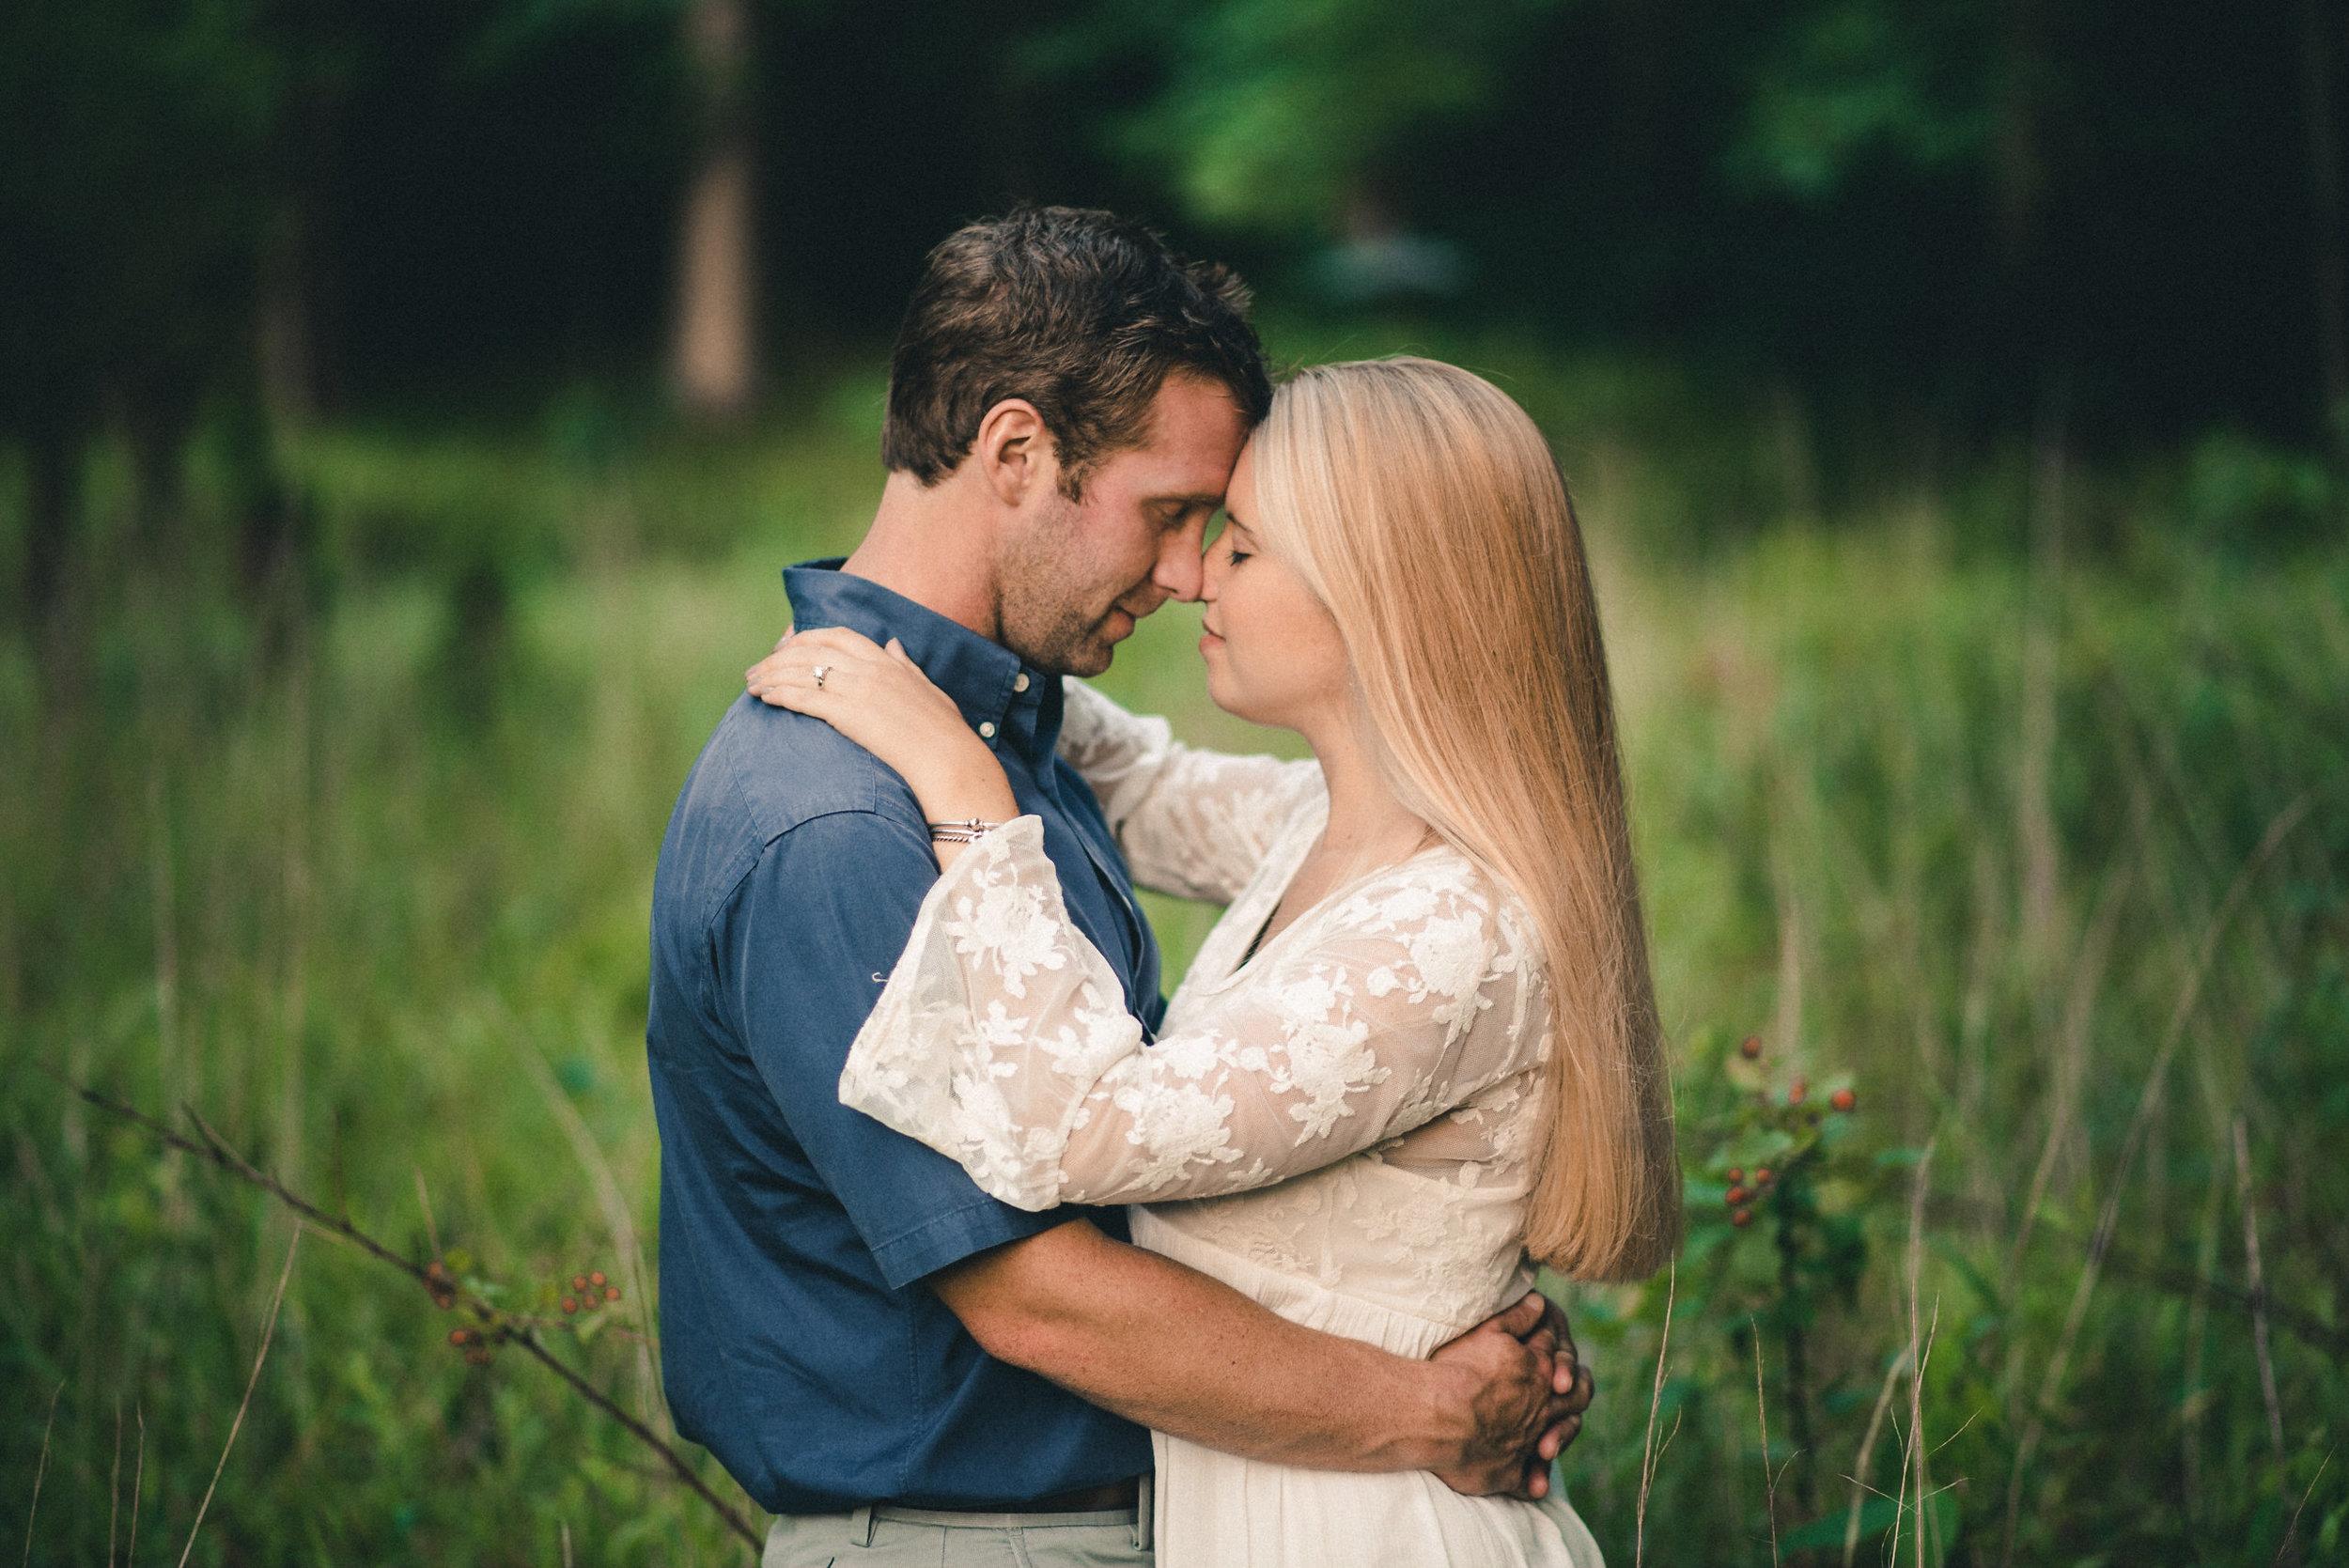 Couple hugging in field